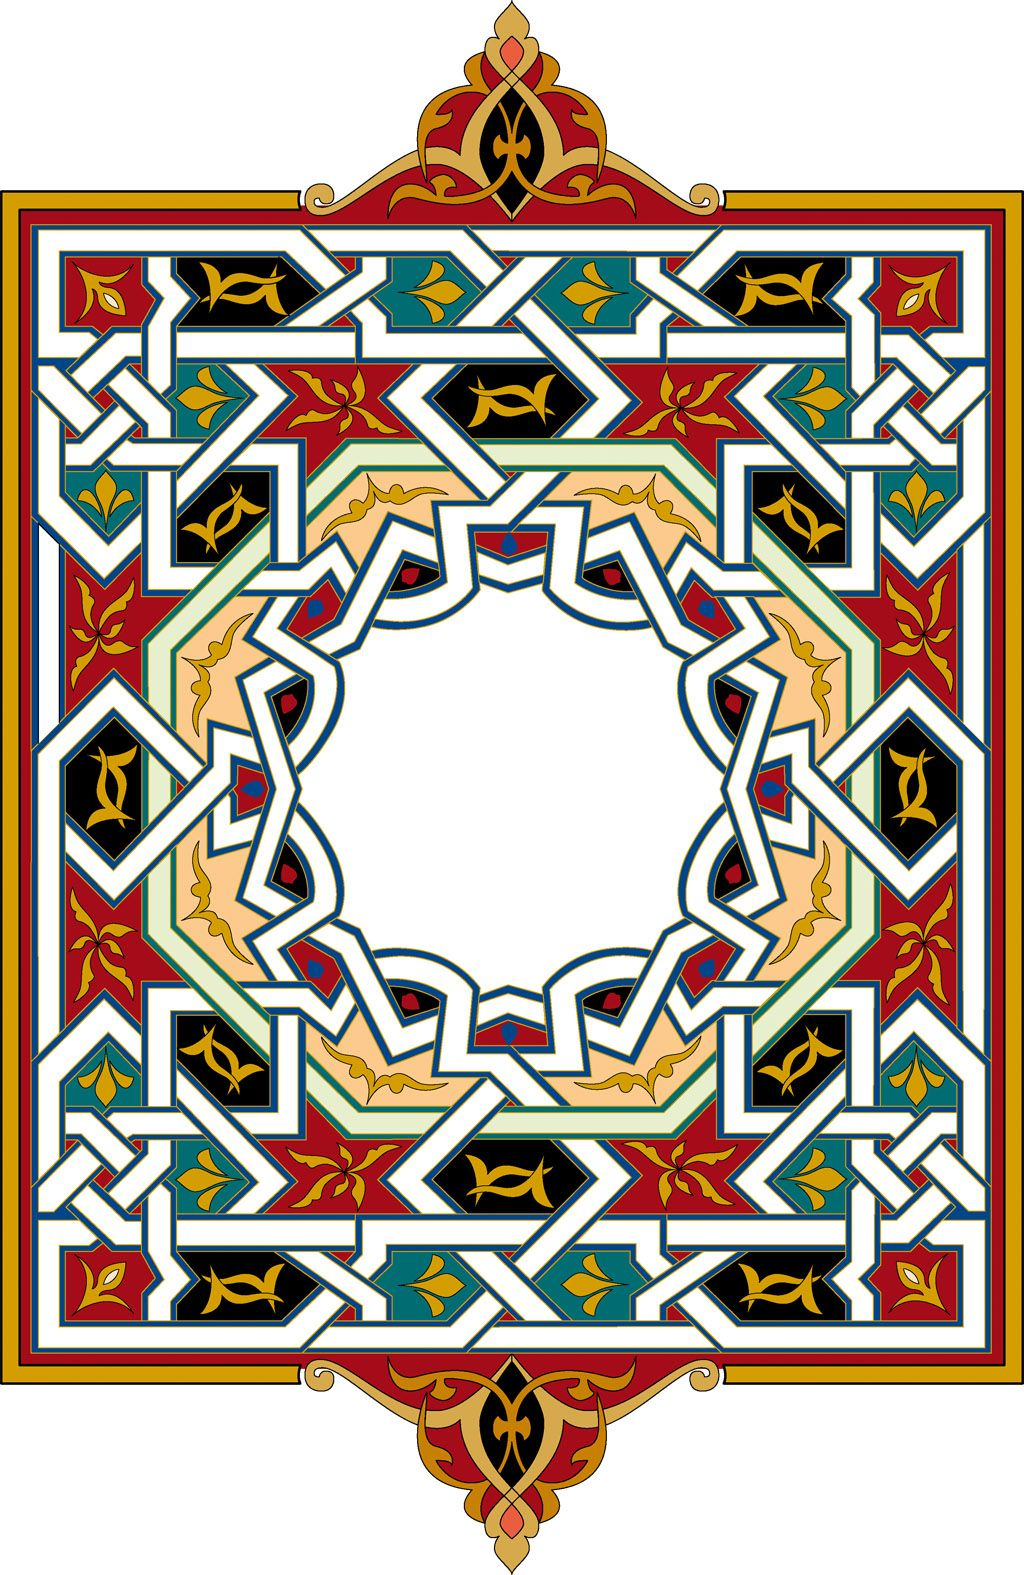 motif de viande Islamique ottoman (47) Arabesk, Desenler